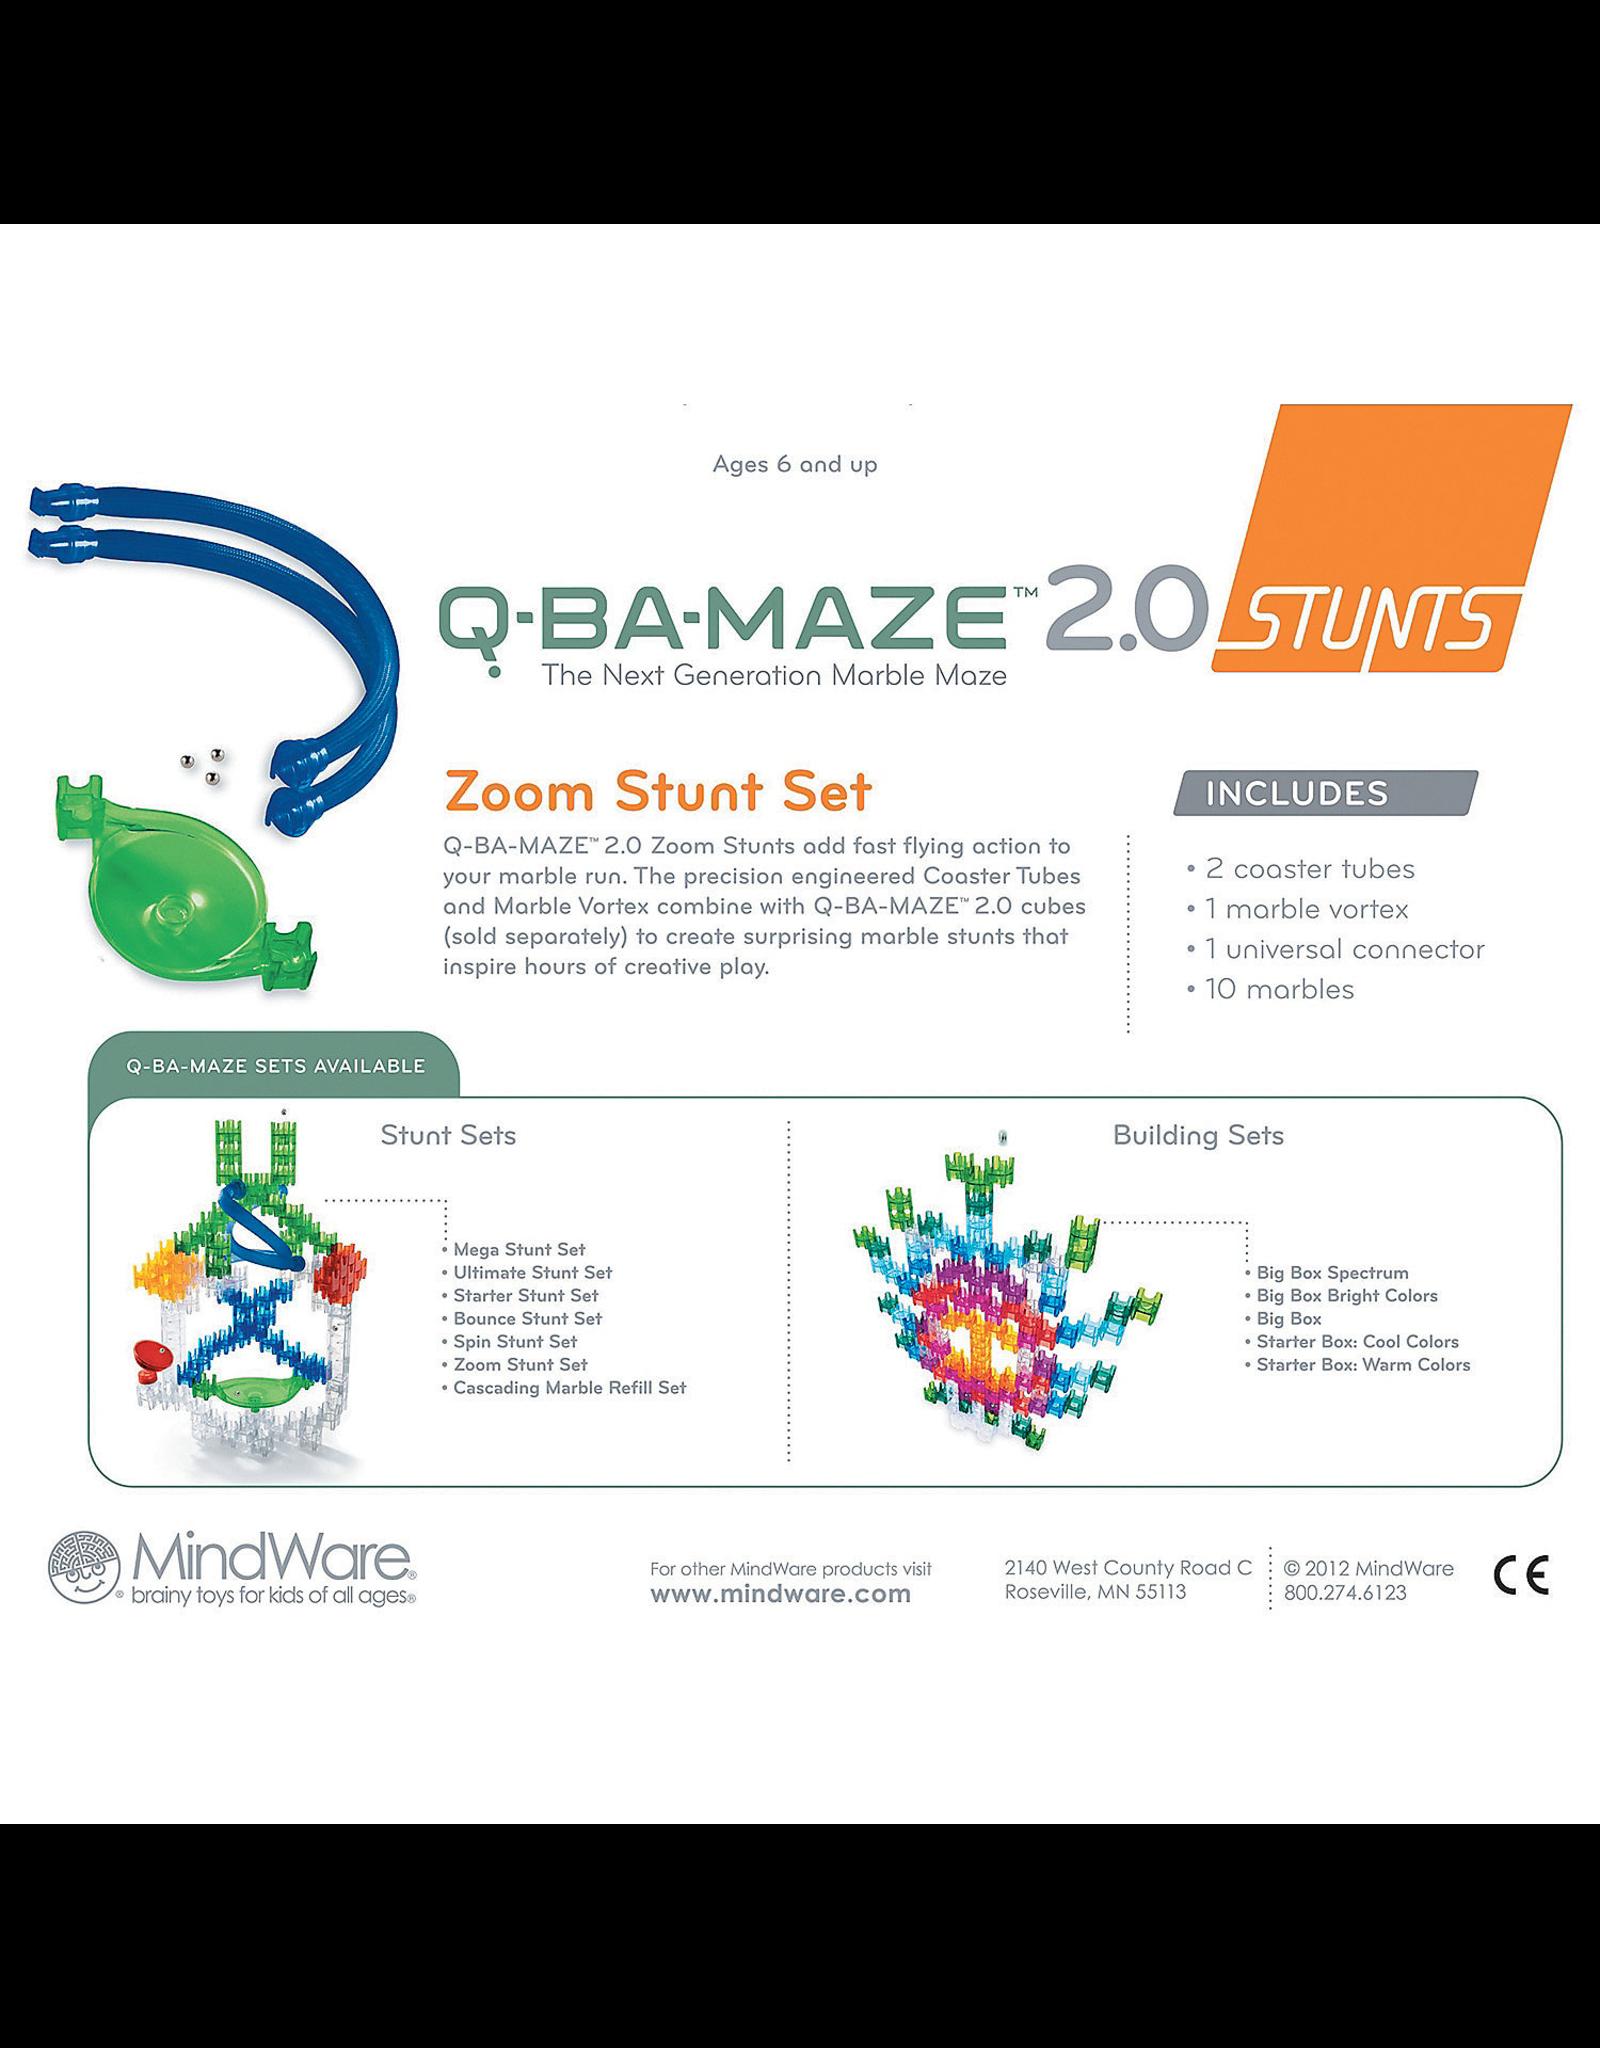 Mindware Q-Ba-Maze 2.0 Zoom Stunt Set